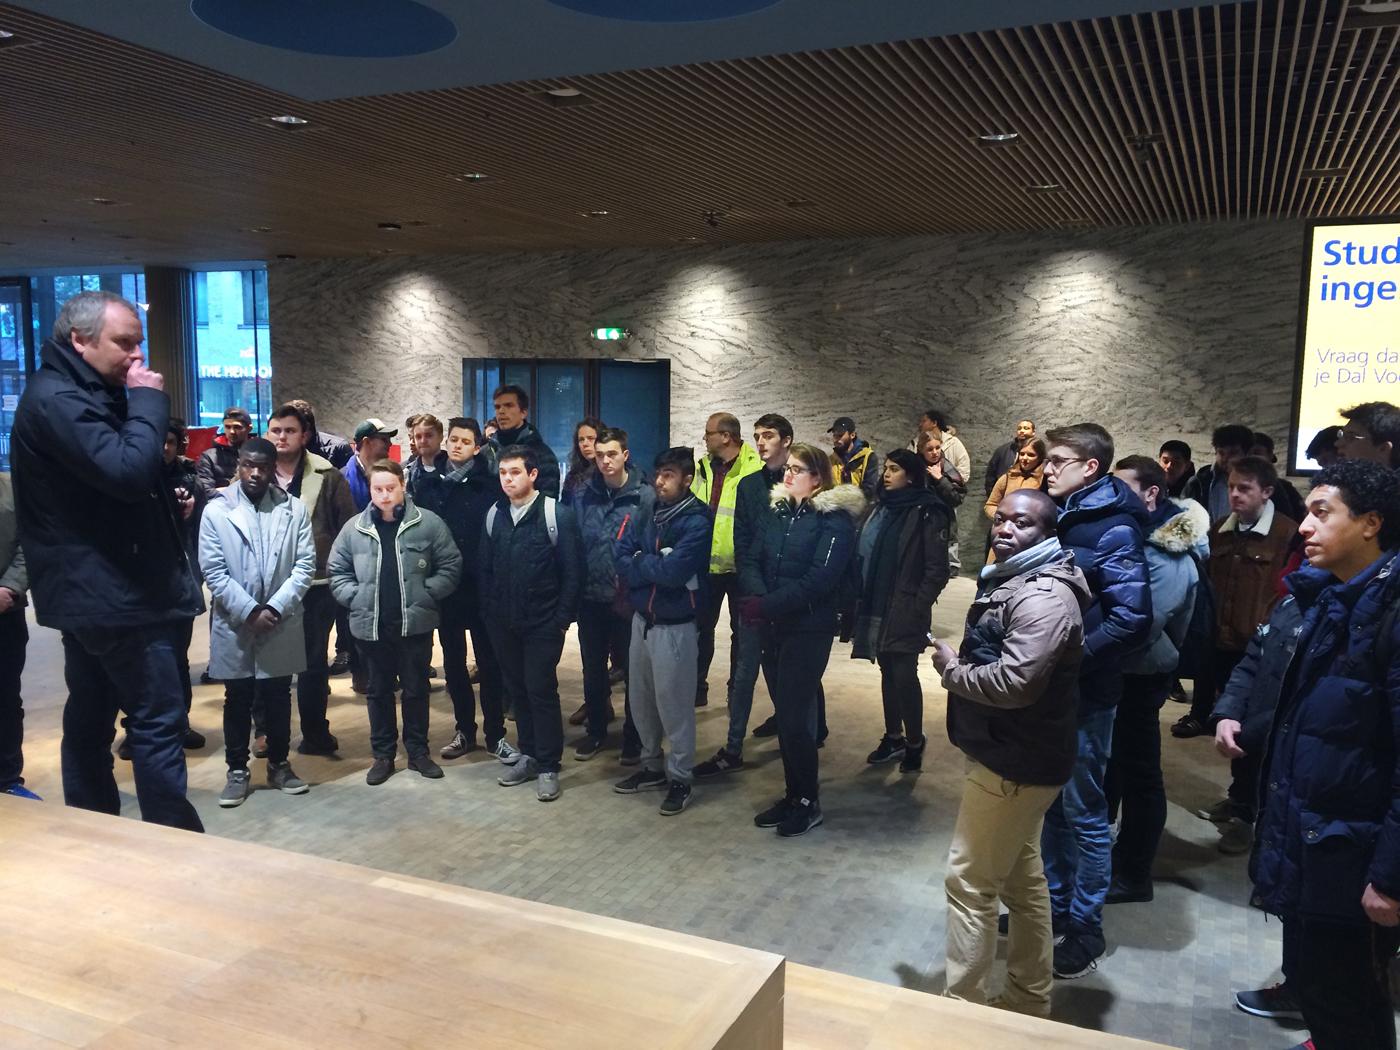 Een groep Engelse architectuurstudenten bezocht donderdag 26 januari station Breda.